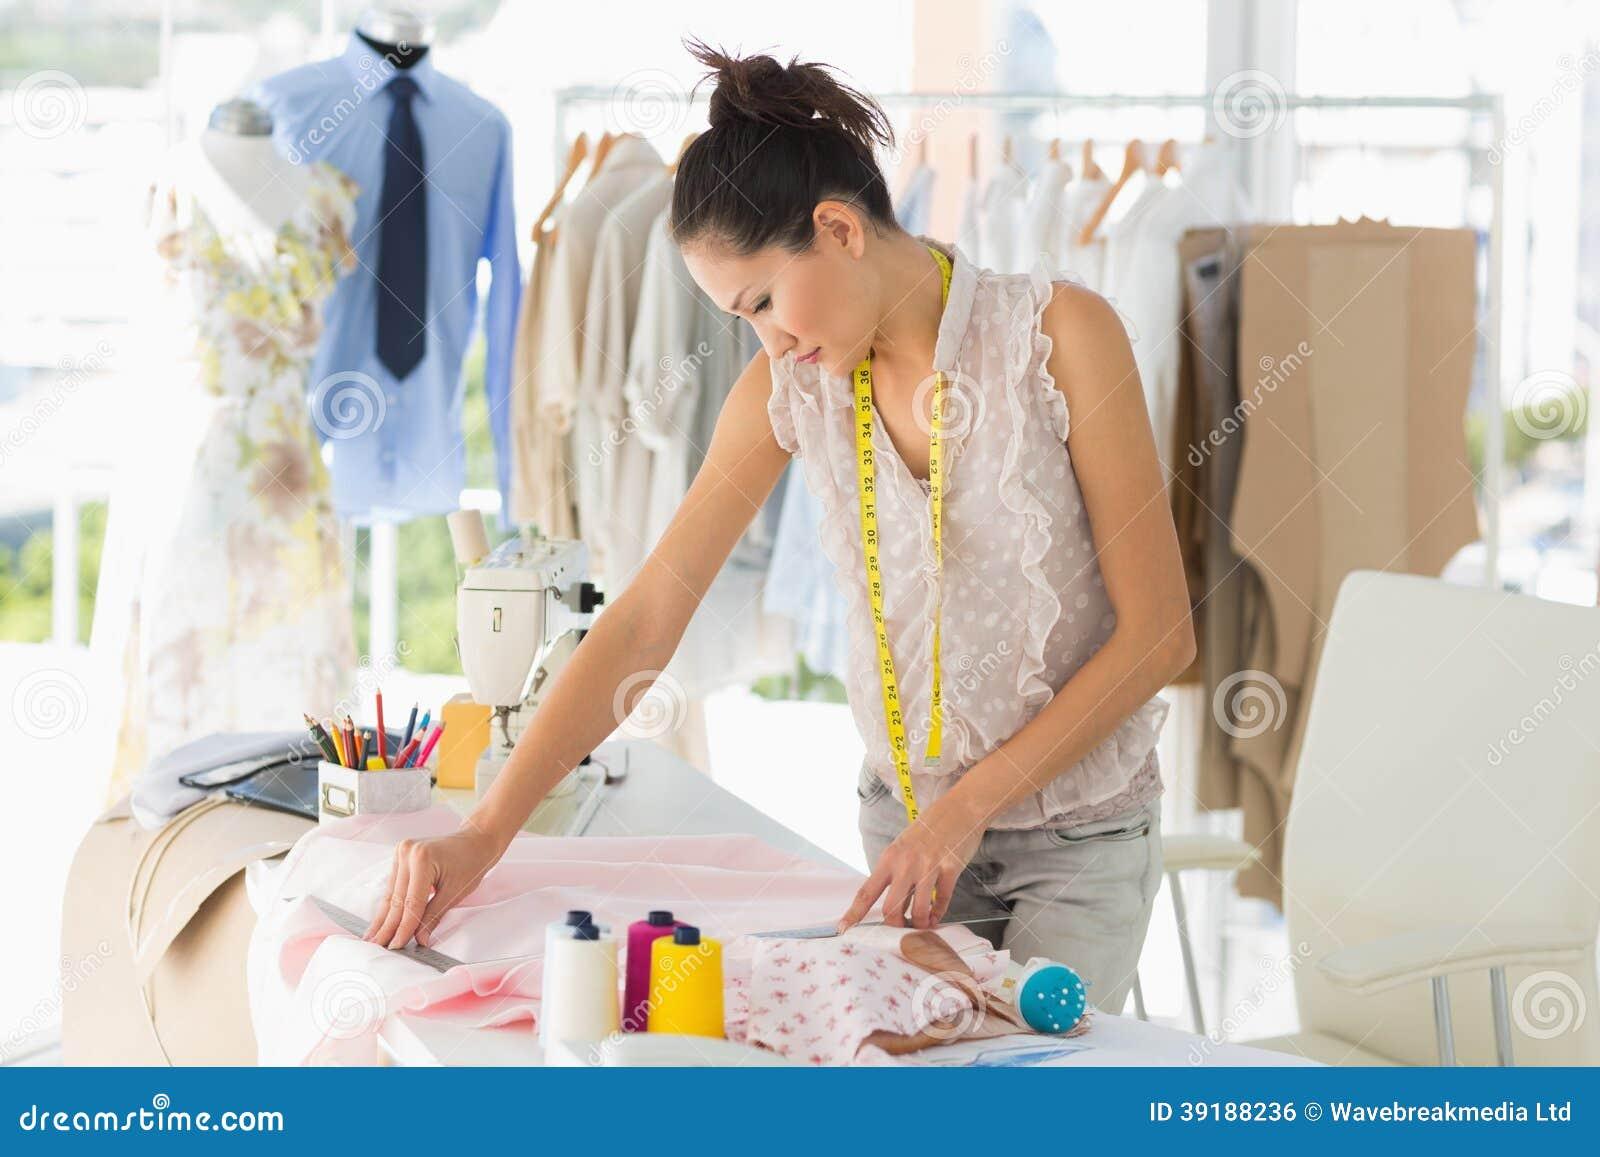 Young Female Fashion Designer Working On Fabrics Royalty ...